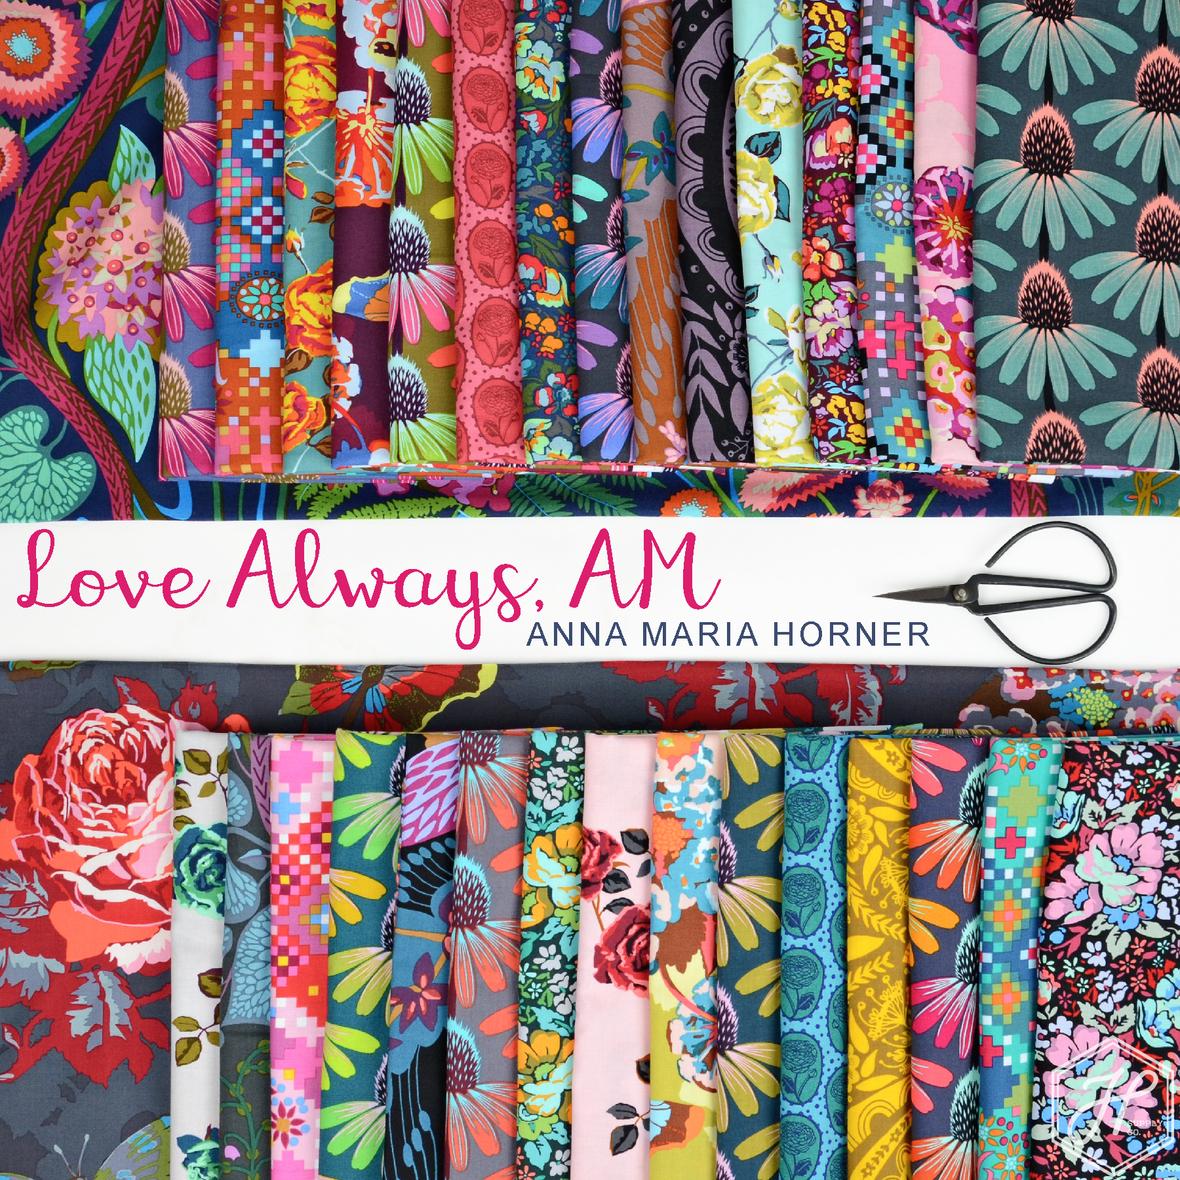 Love Always AM Fabric Anna Maria Horner for Free Spirit at Hawthorne Supply Co